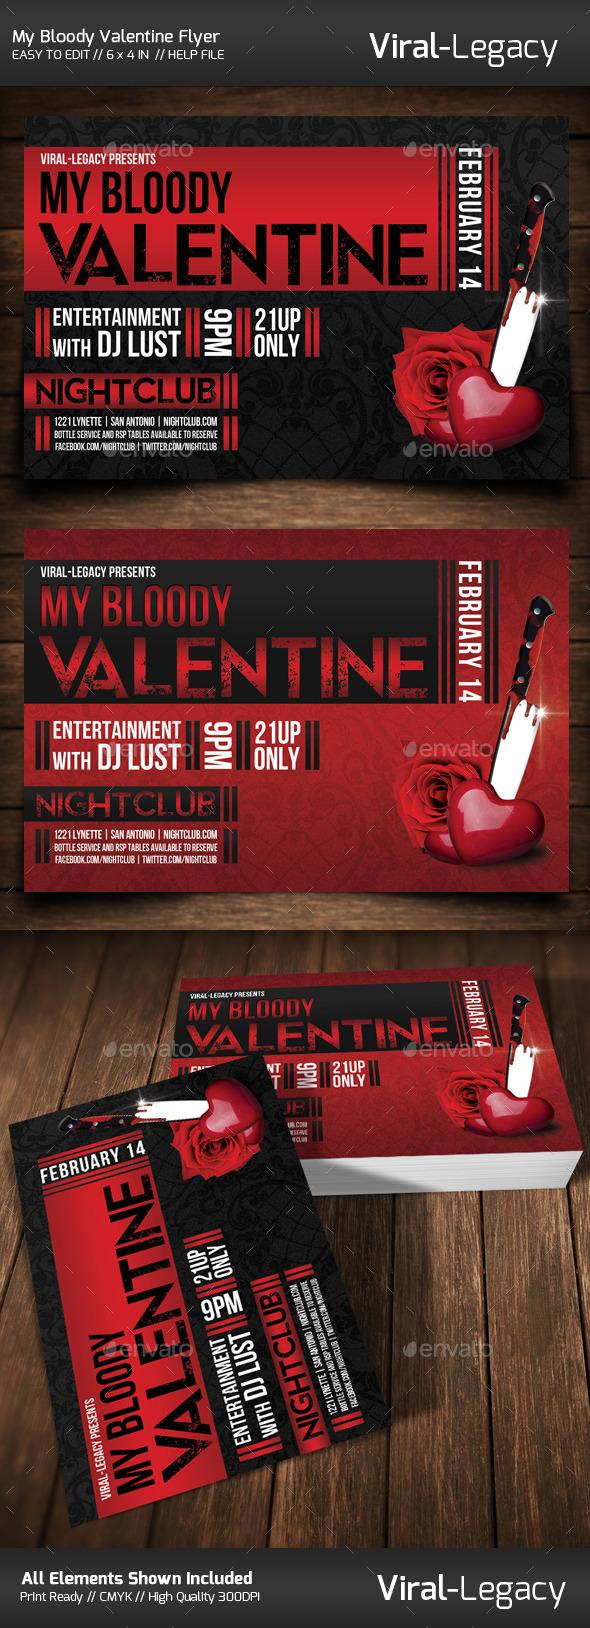 My Bloody Valentine Flyer - Flyers Print Templates